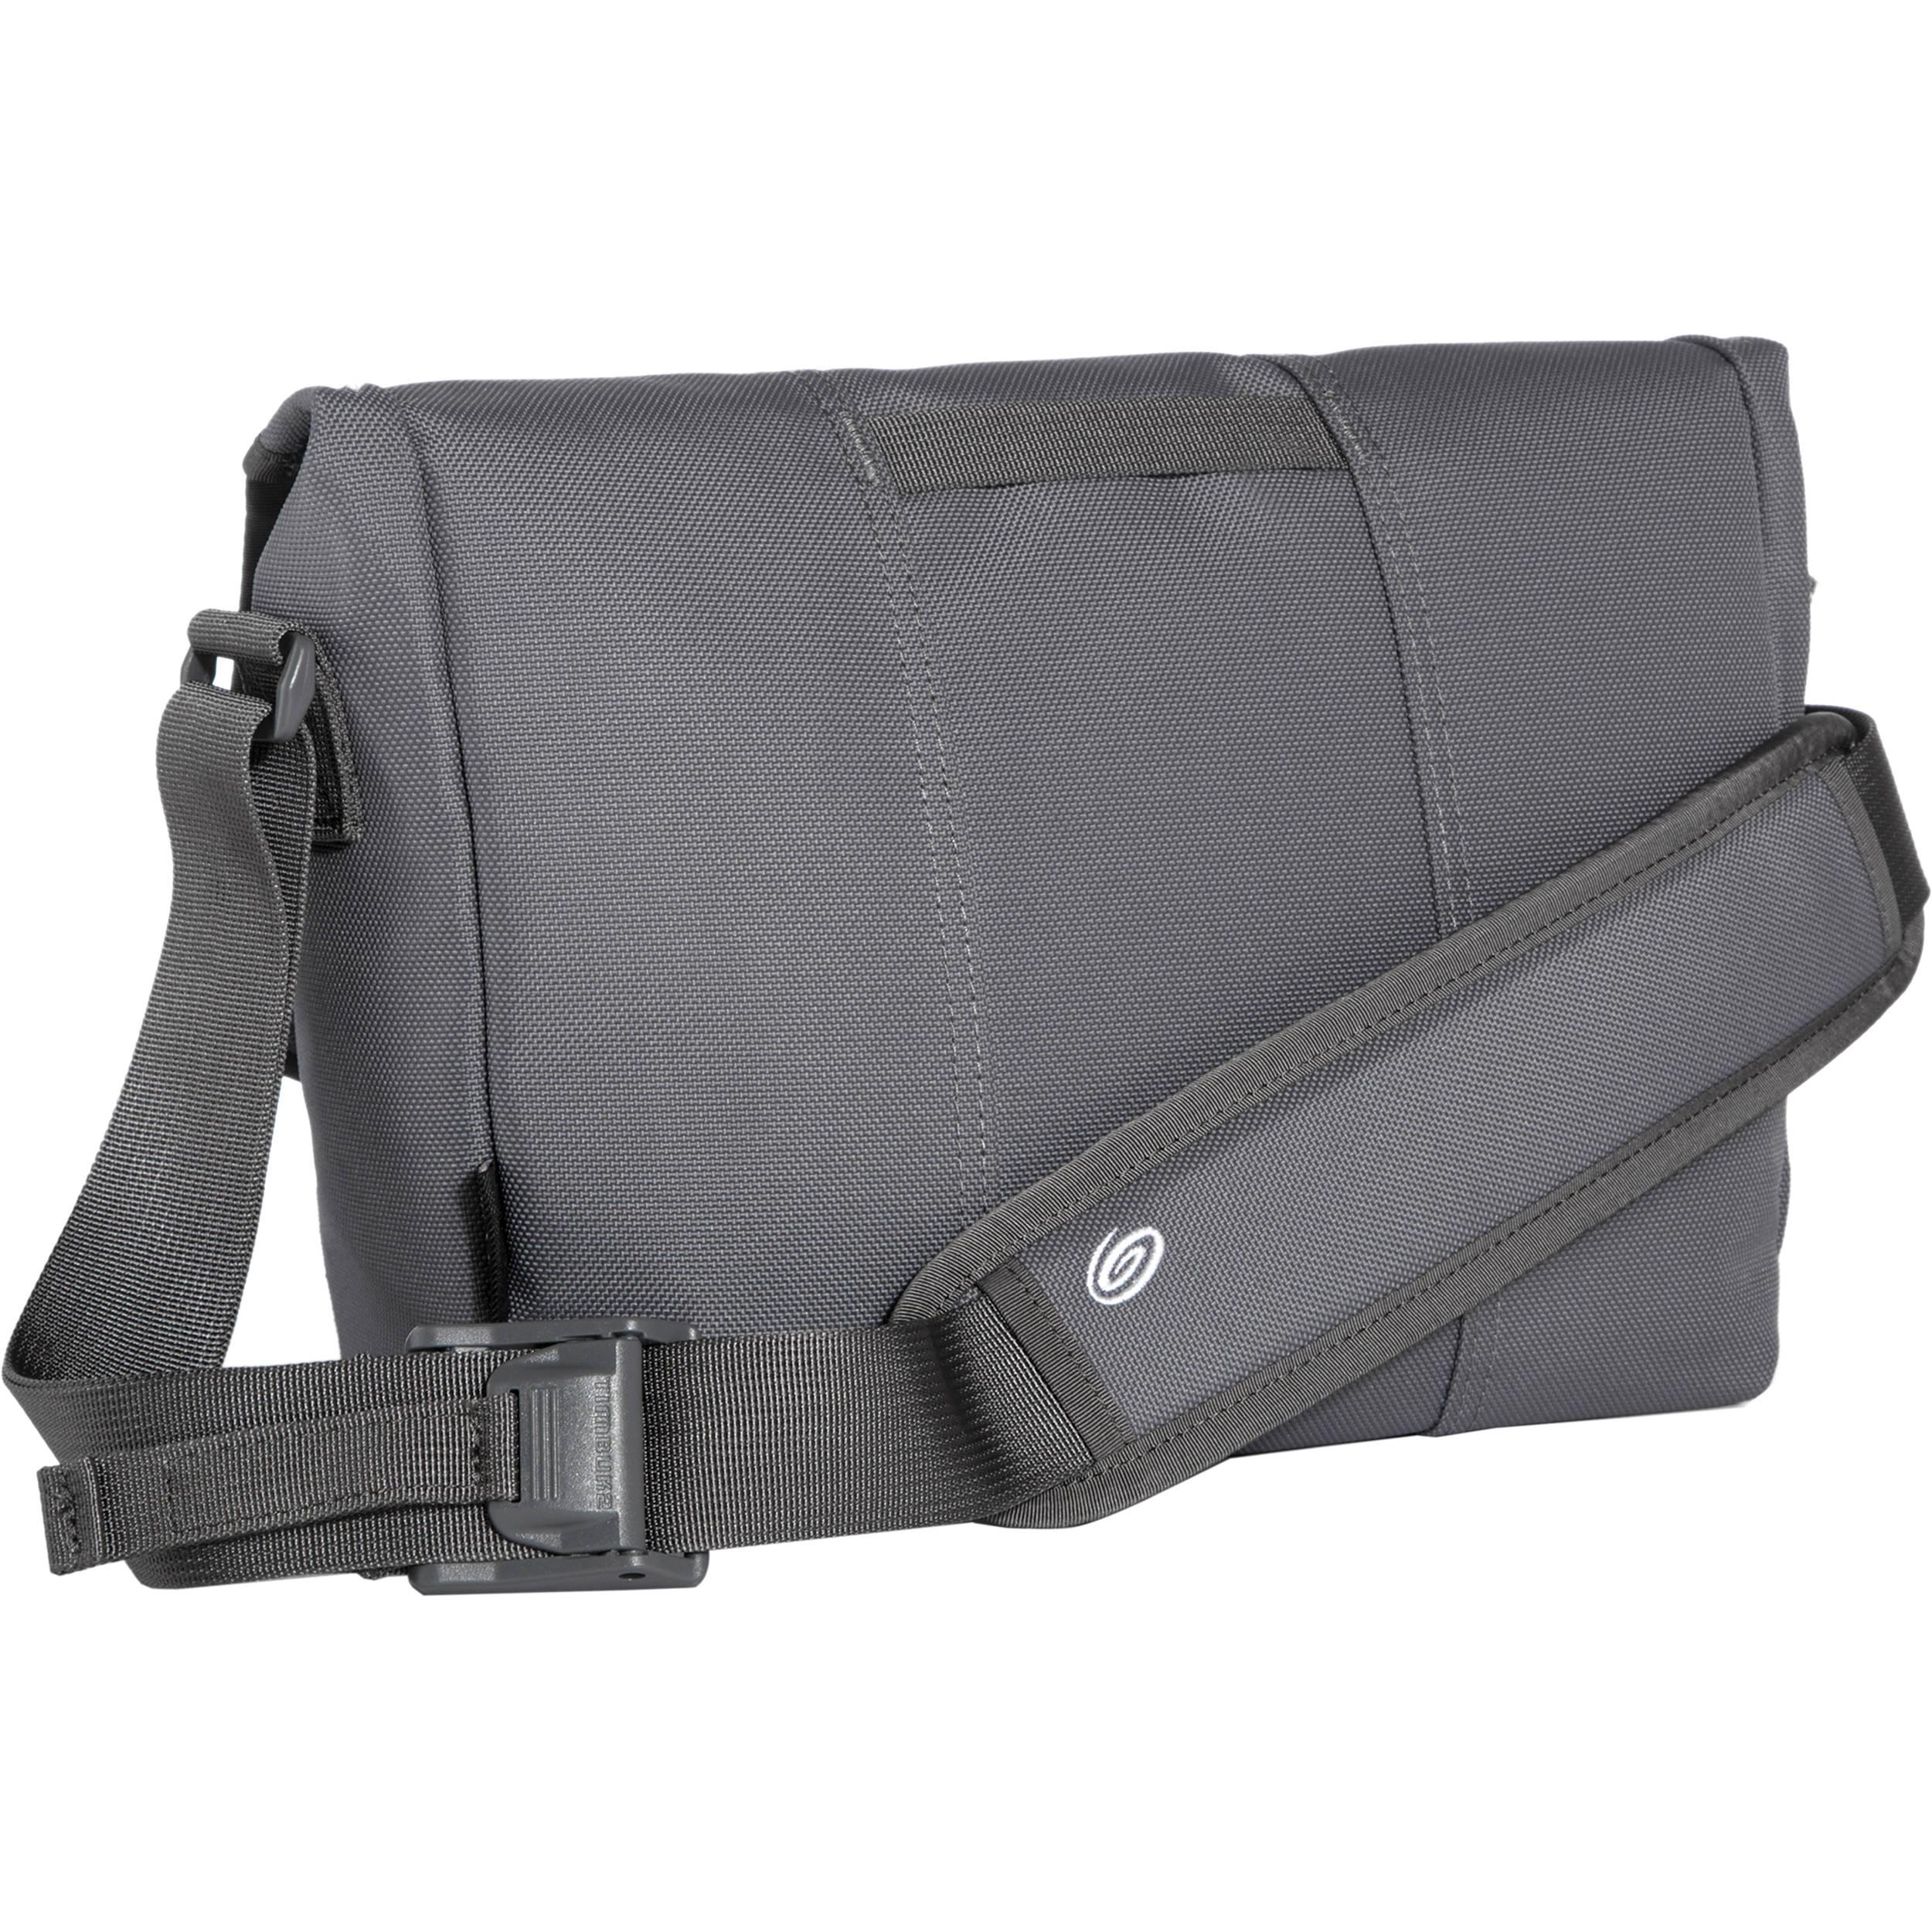 Timbuk2 Unicolor Classic Messenger Bag Large Gunmetal